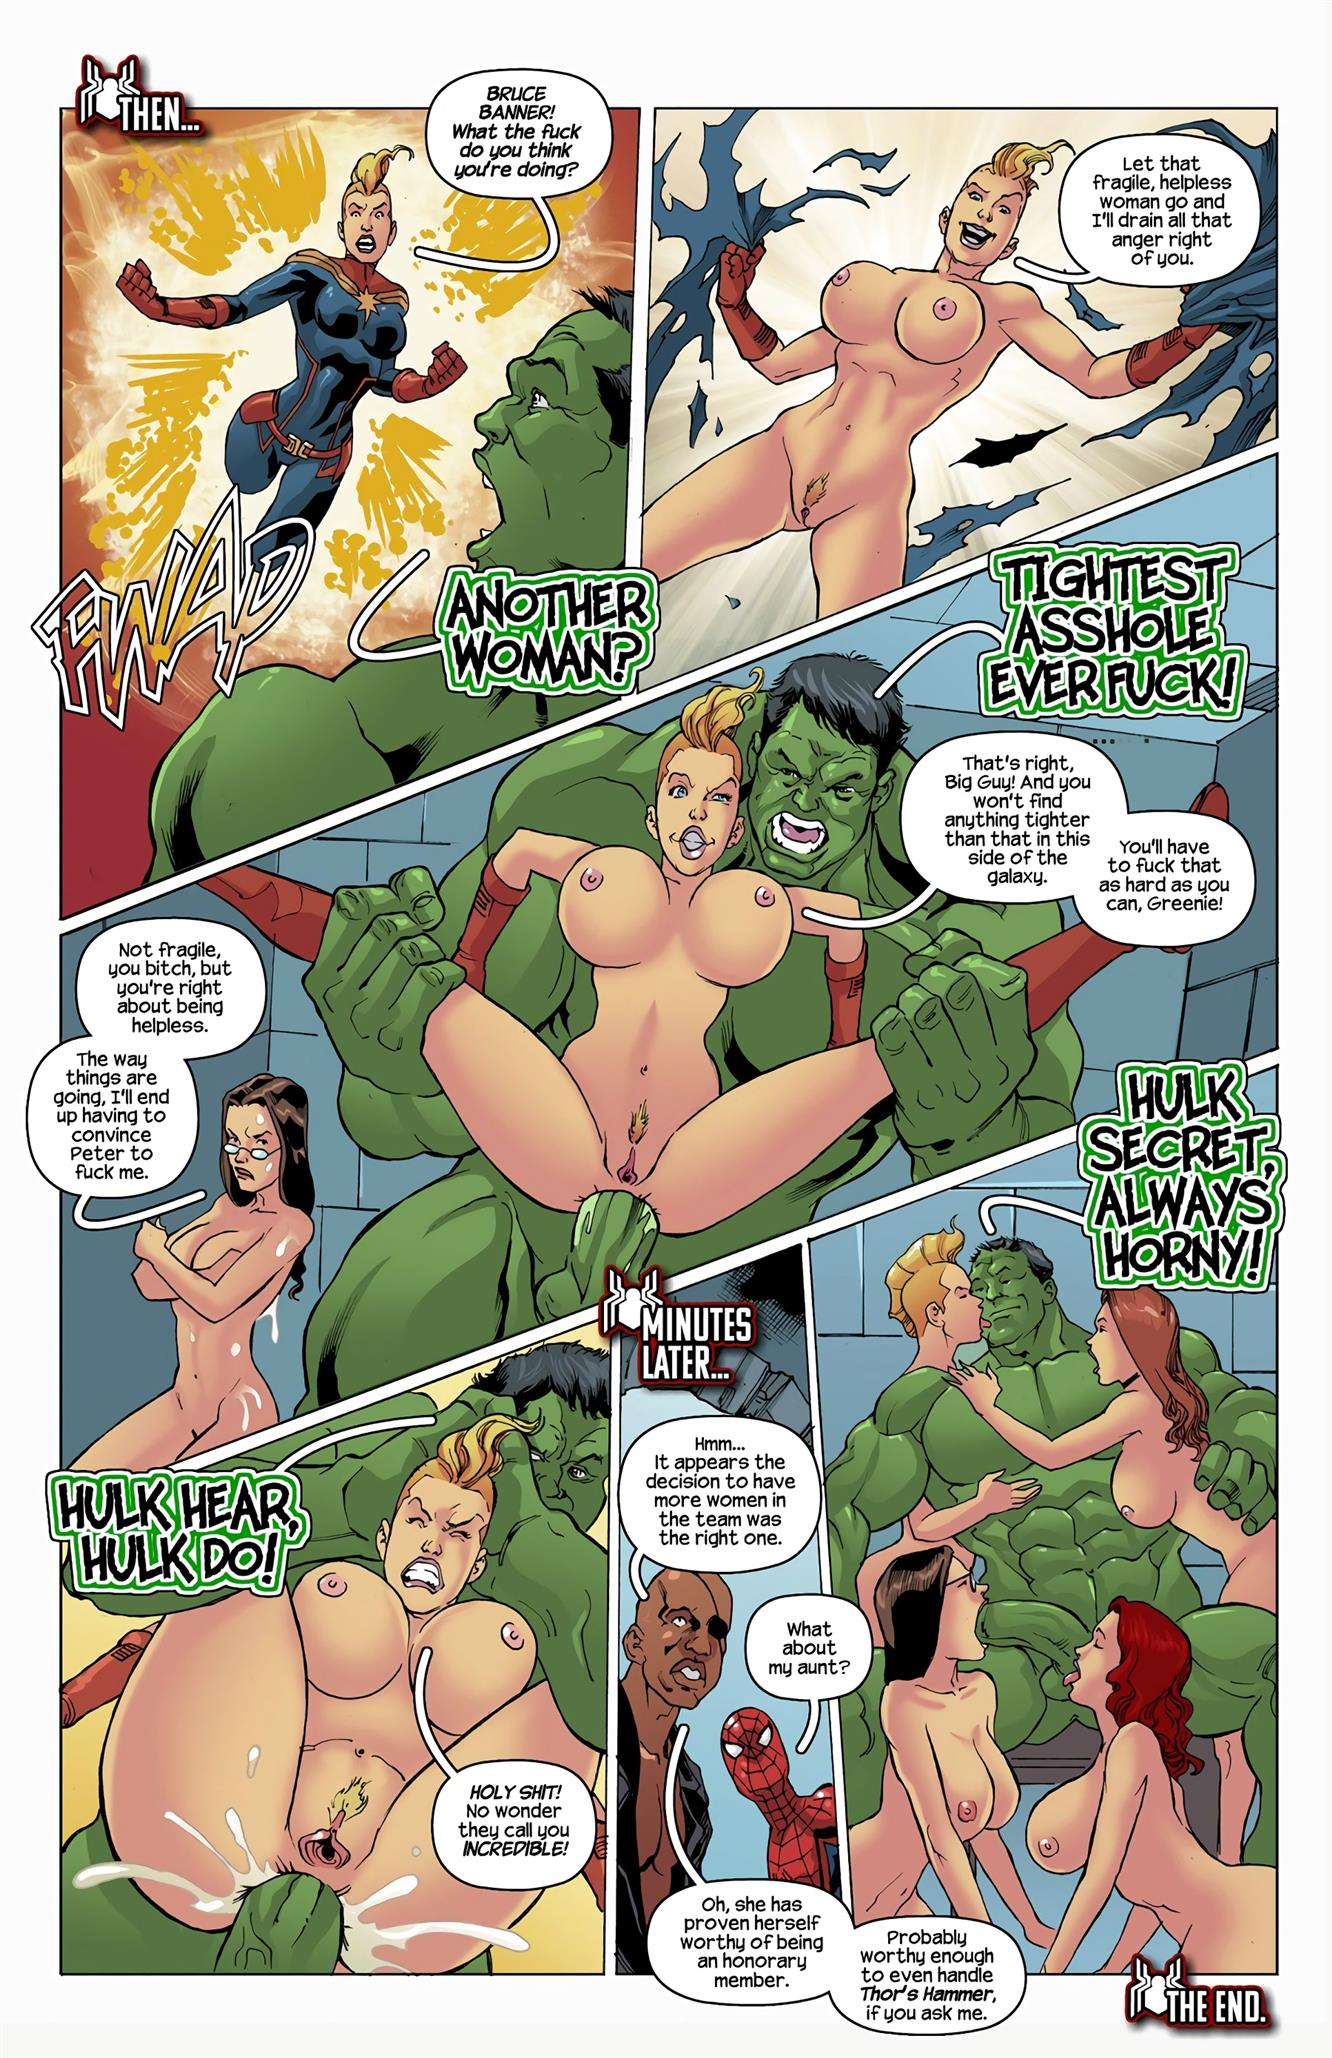 Rekt Control (Spider-Man , The Avengers) - Foto 10